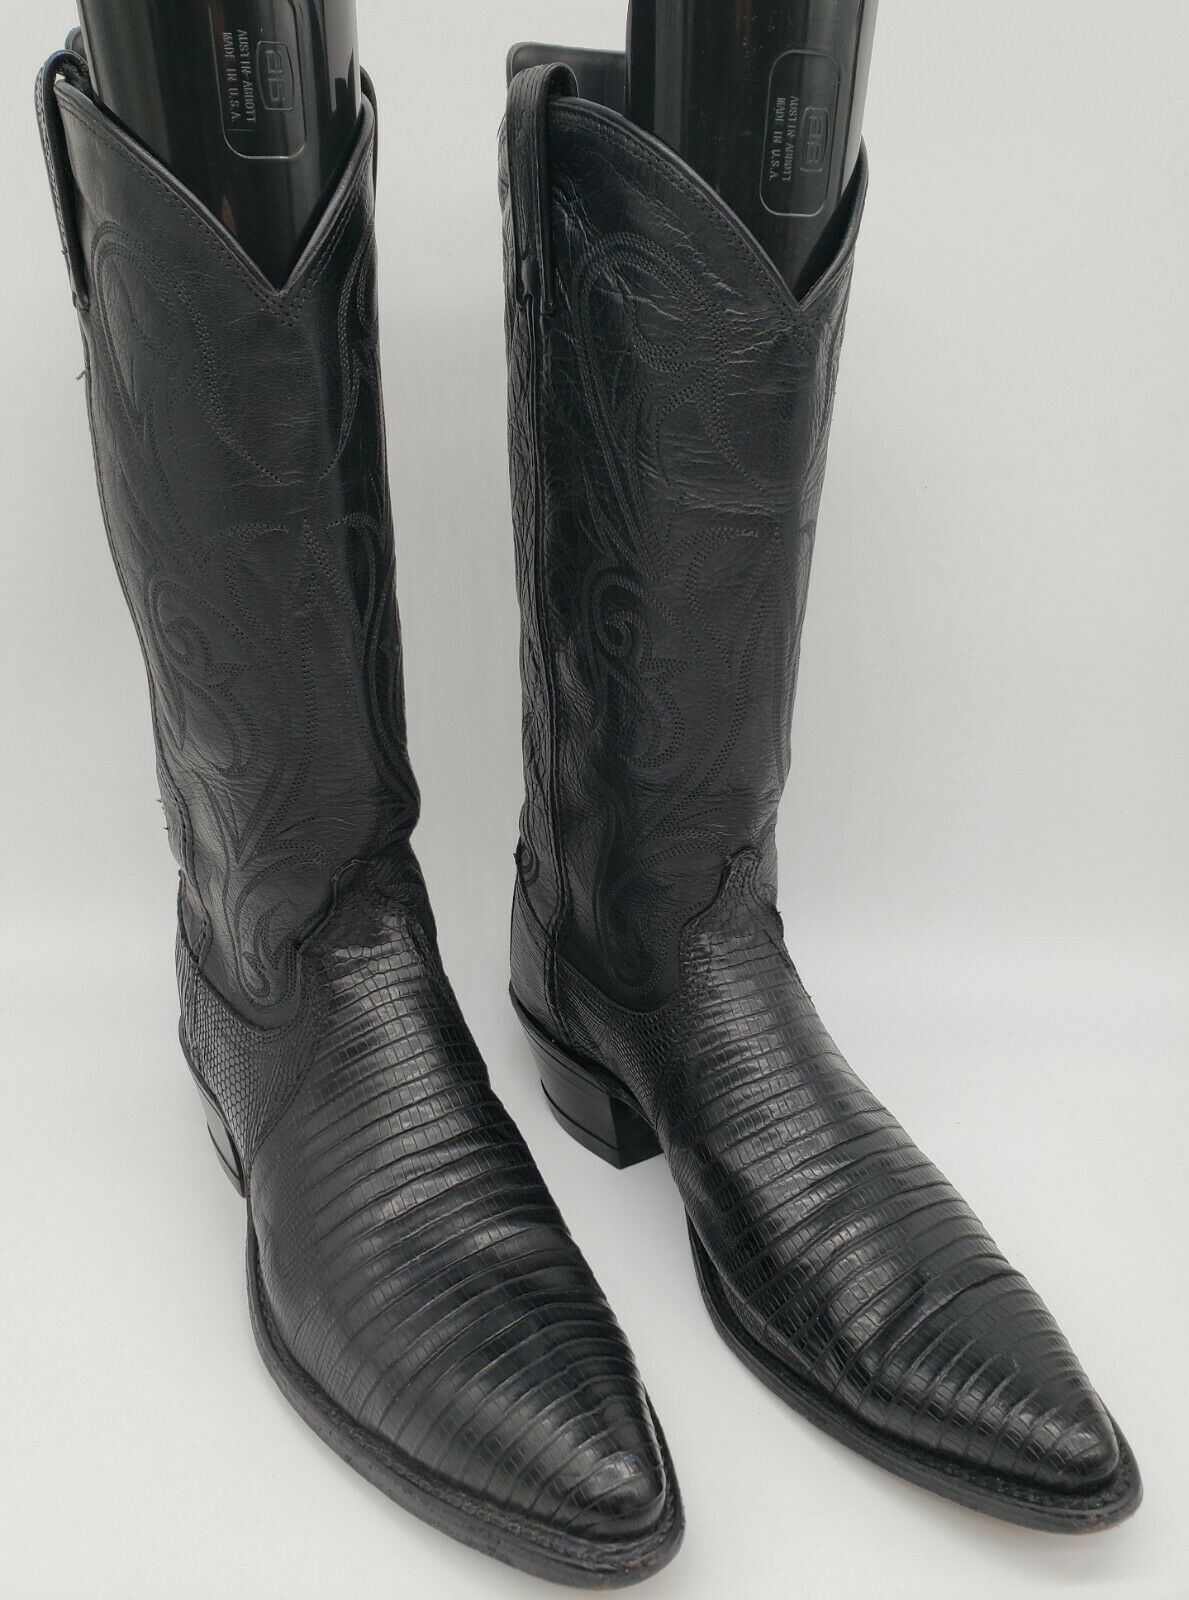 8M Women\u2019s Dan Post Lizard Cowboy Boots